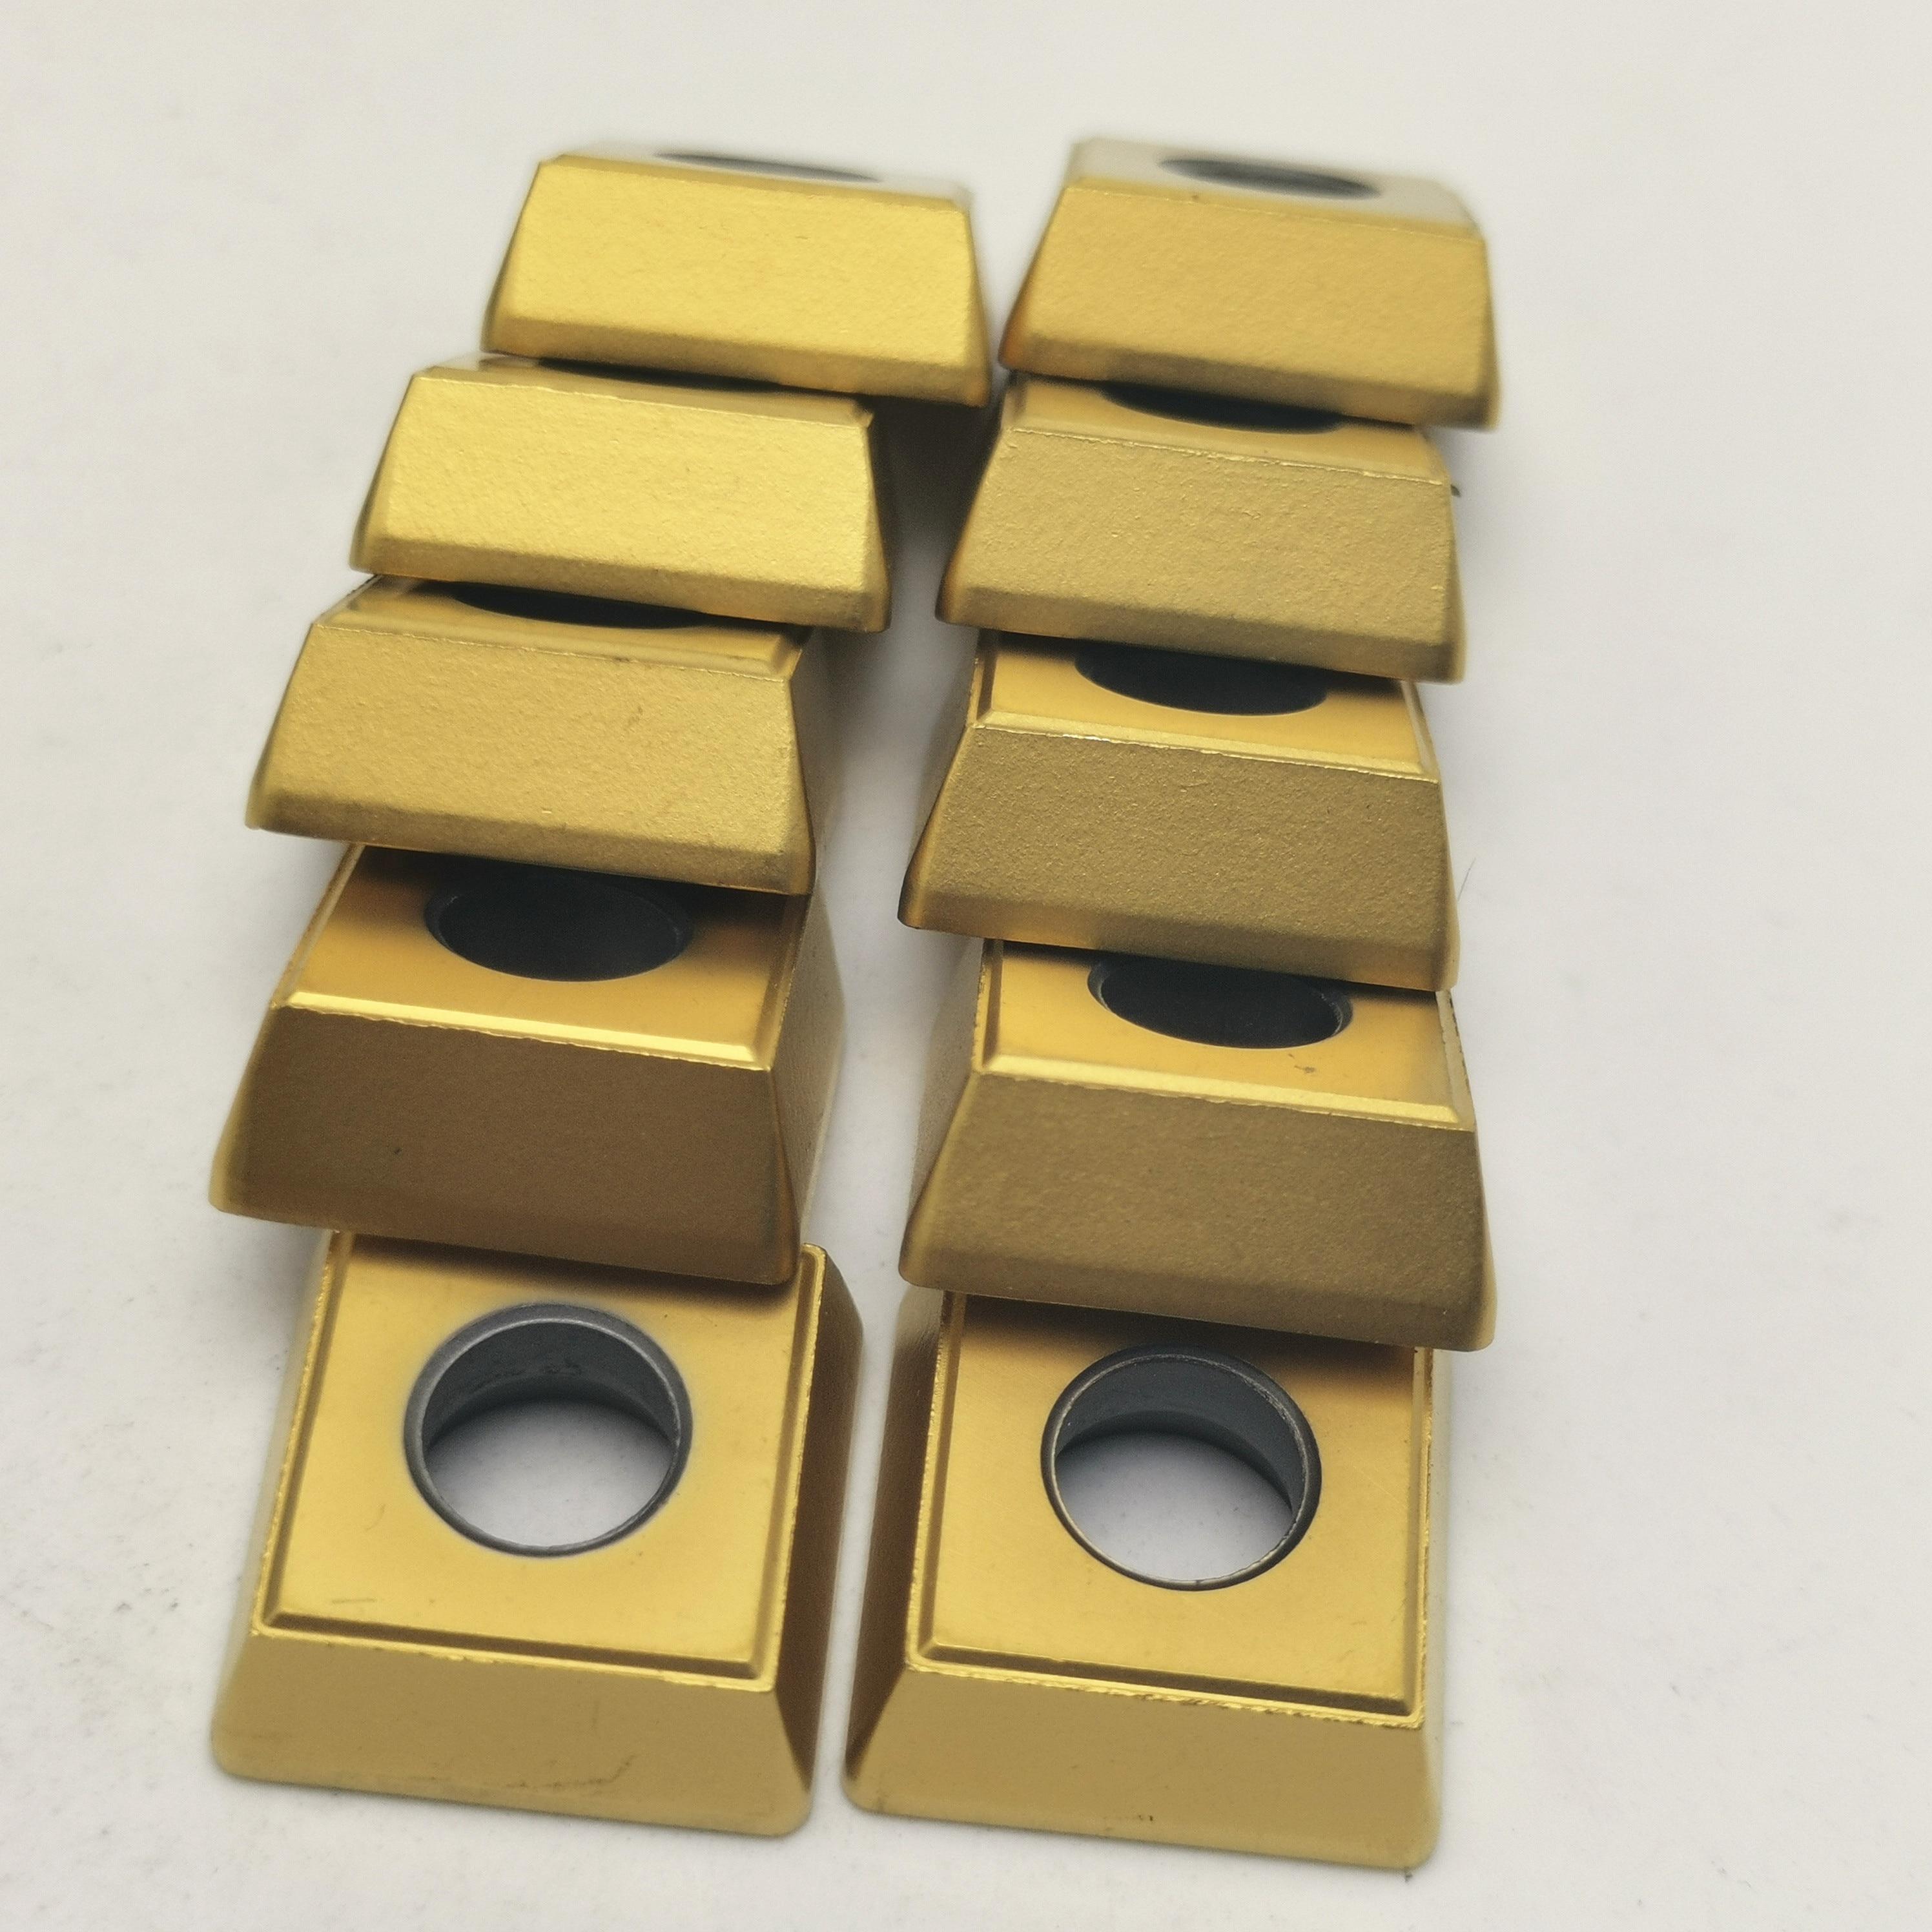 100PCS SPMG140512 DG TT8020 Carbide Insert Turning Tool Milling Cutter CNC Cutting Slot end milling cutter